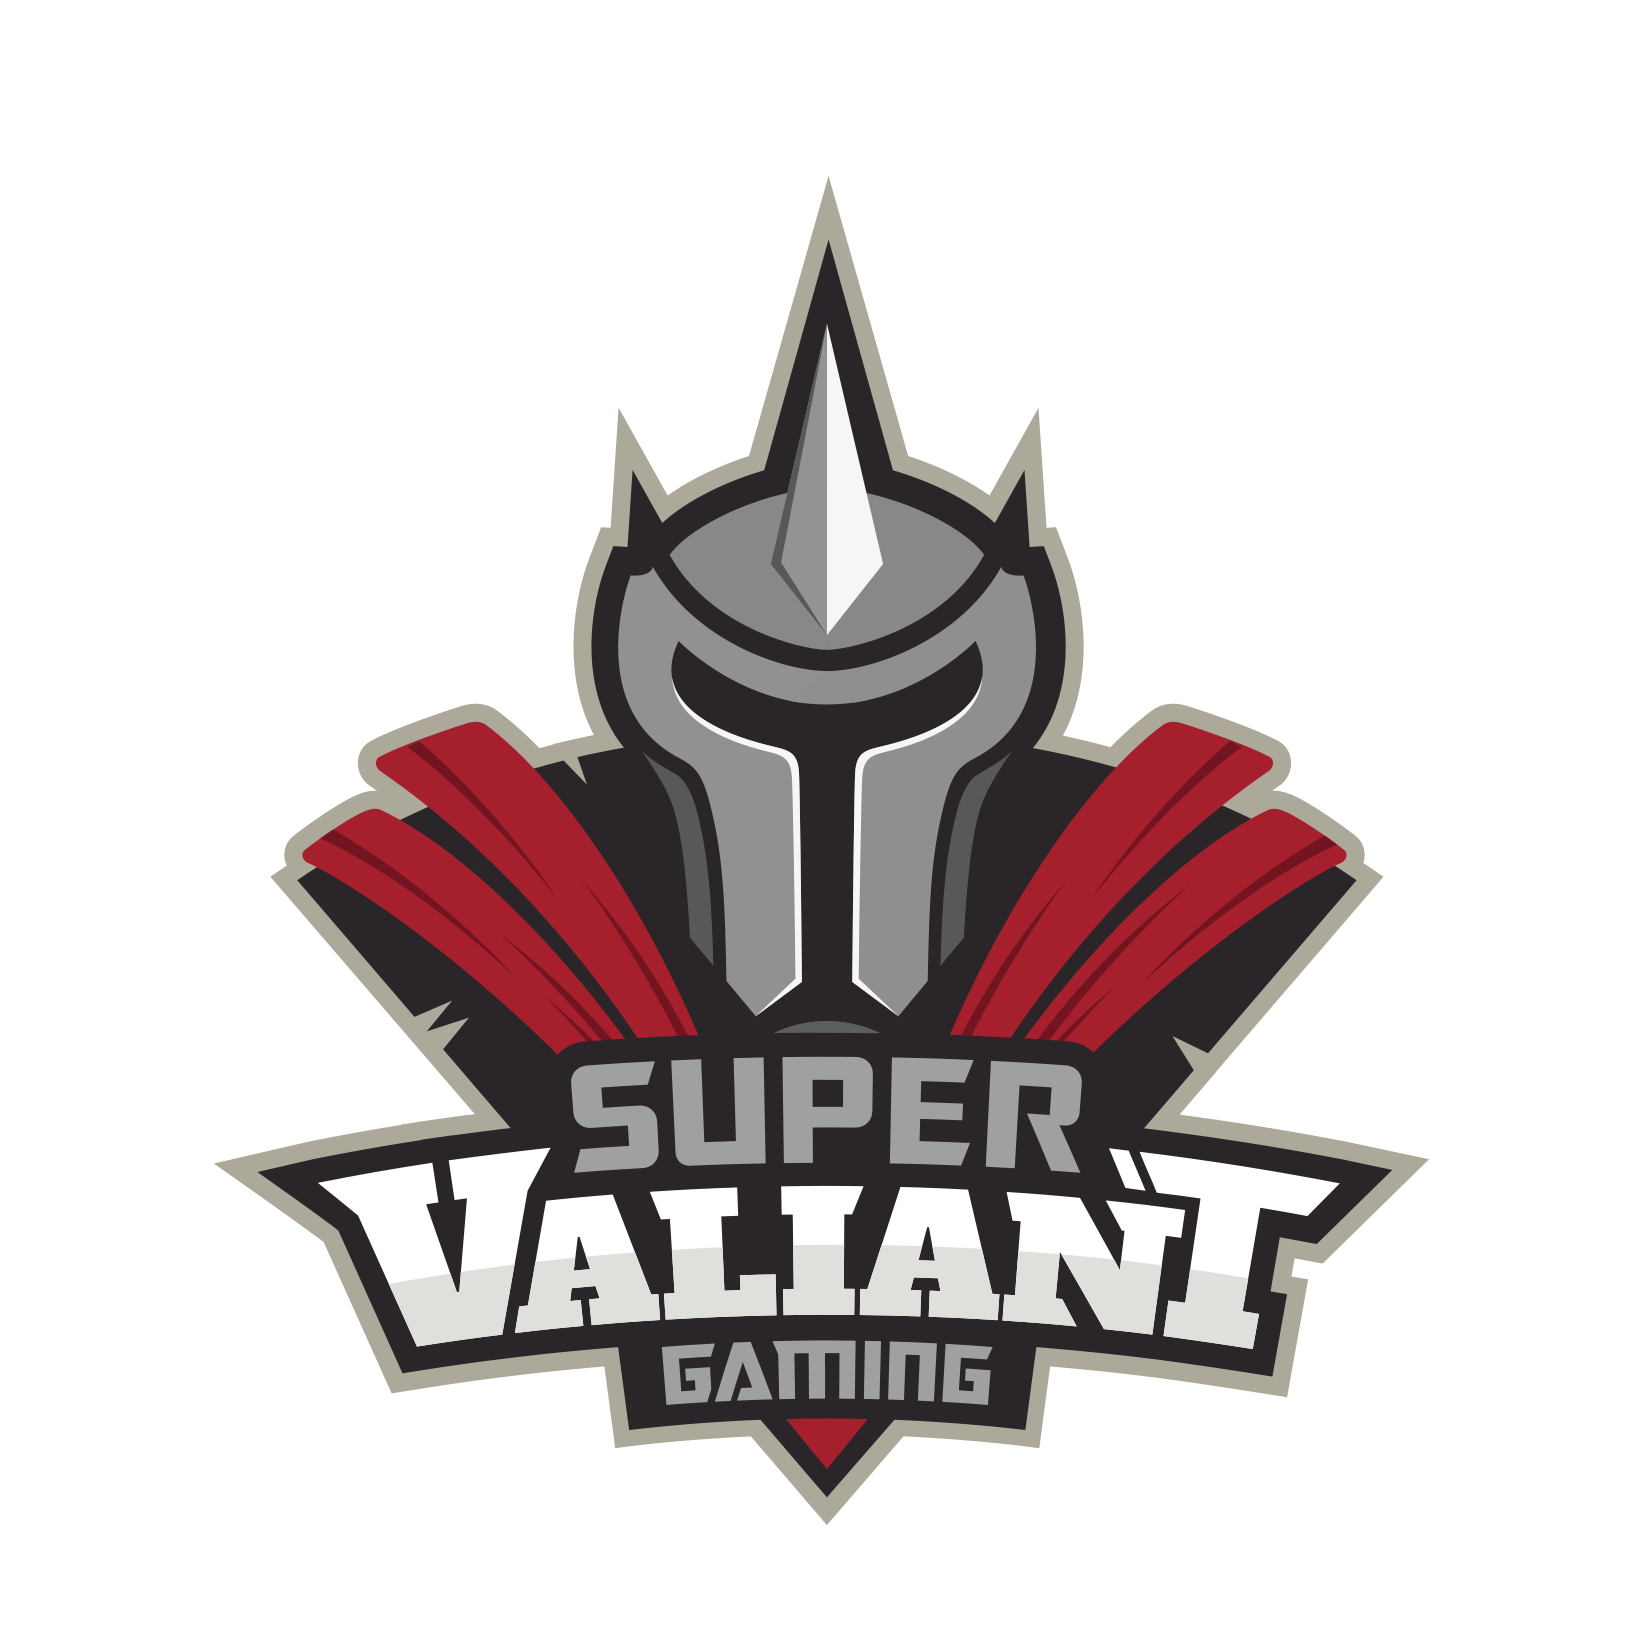 SuperValiant Gaming